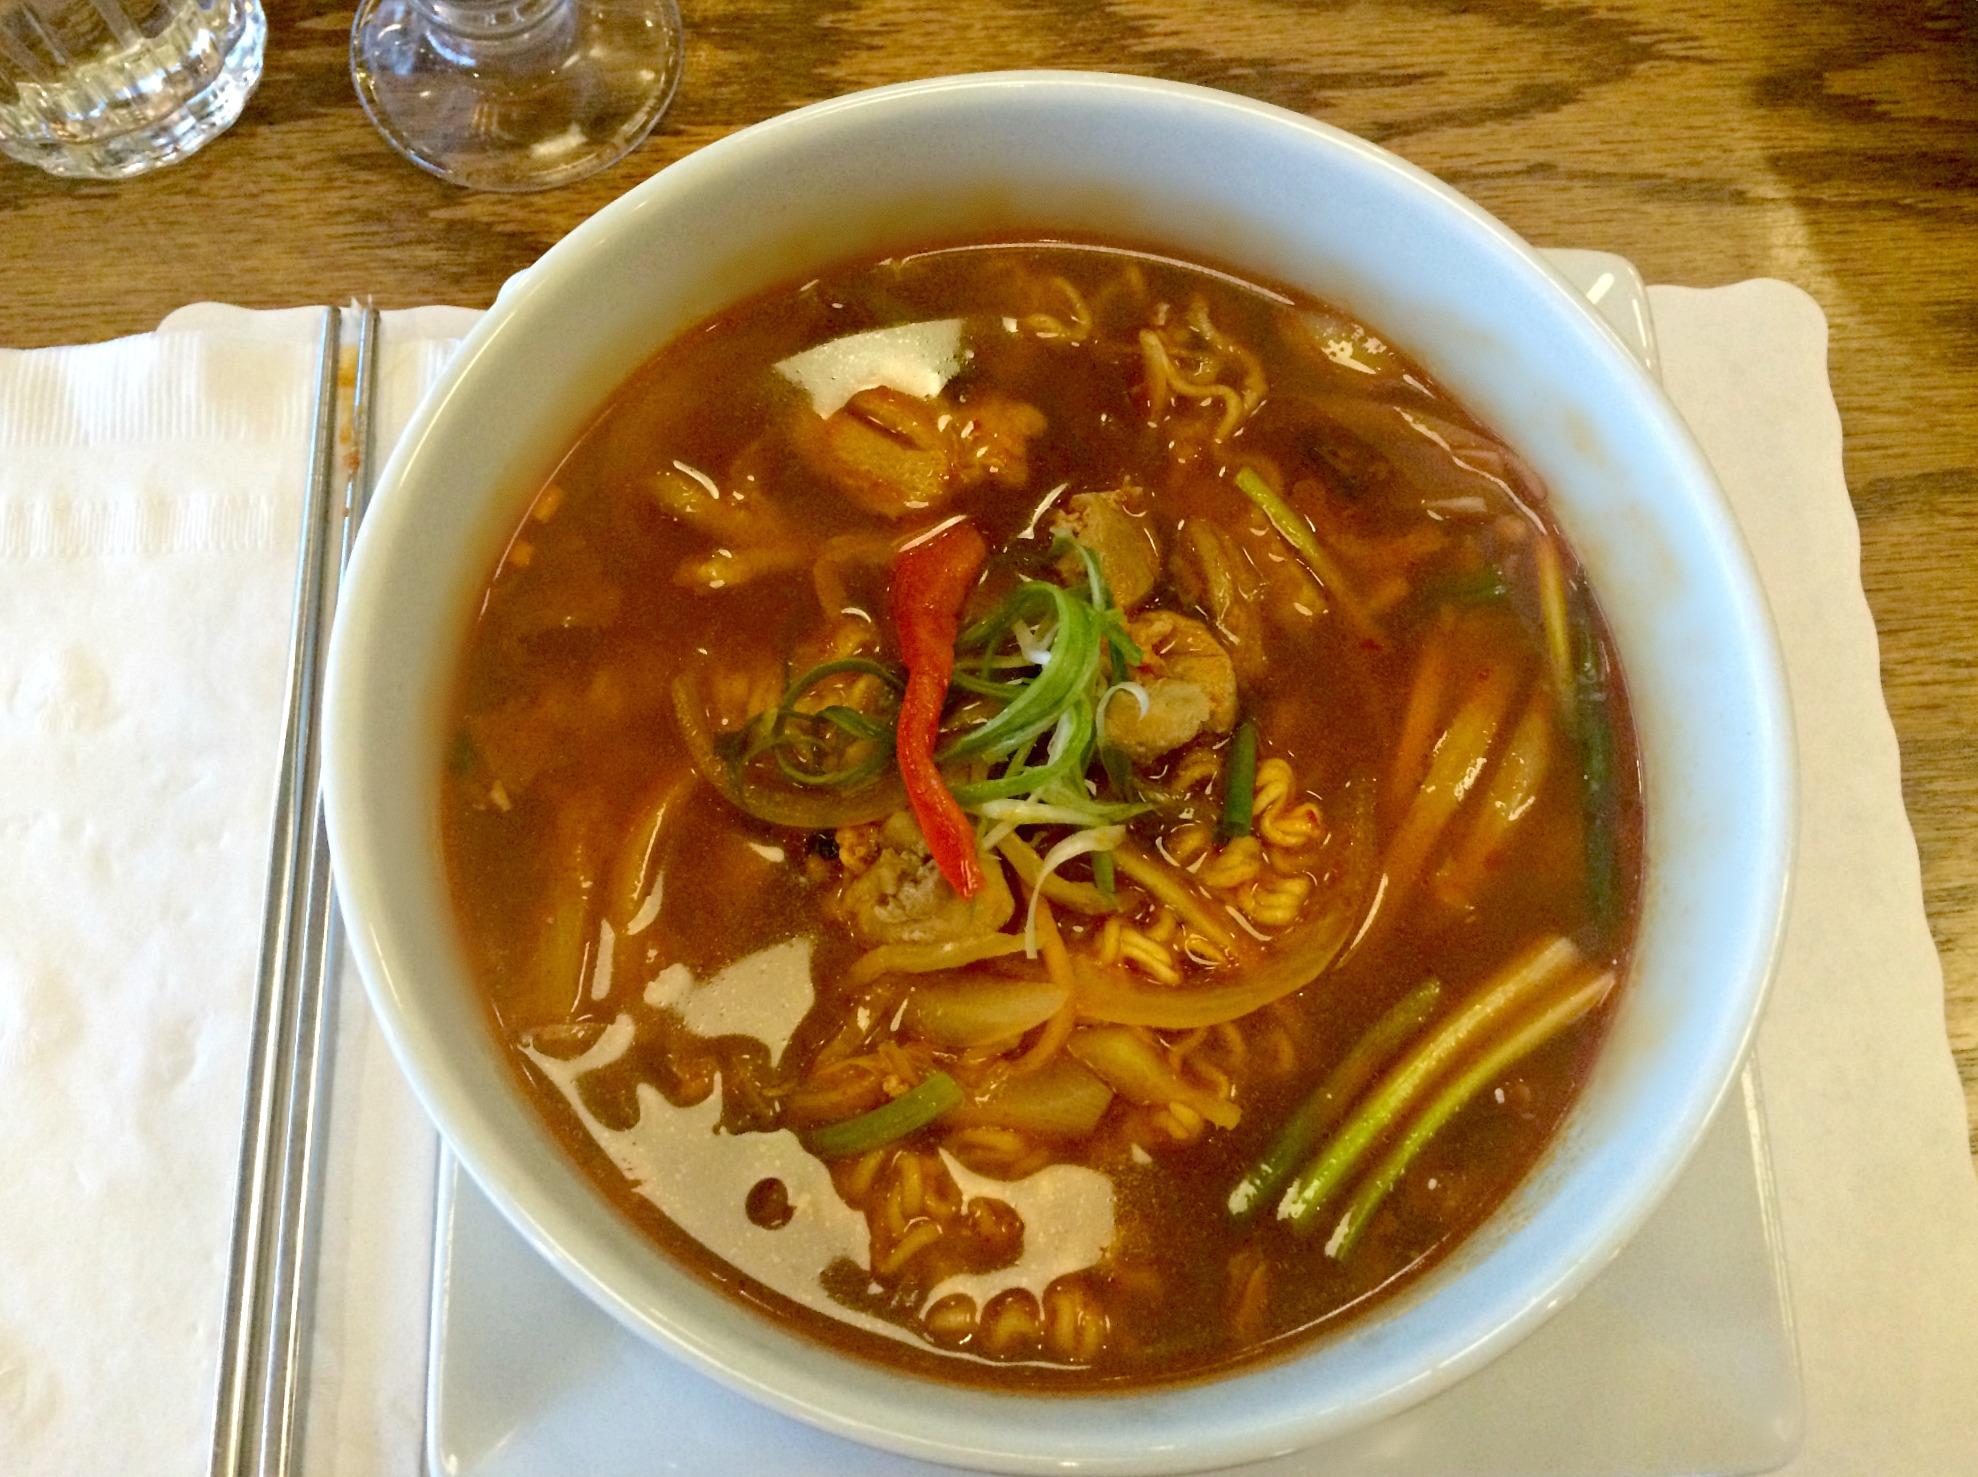 soho spicy ramen noodle bowl